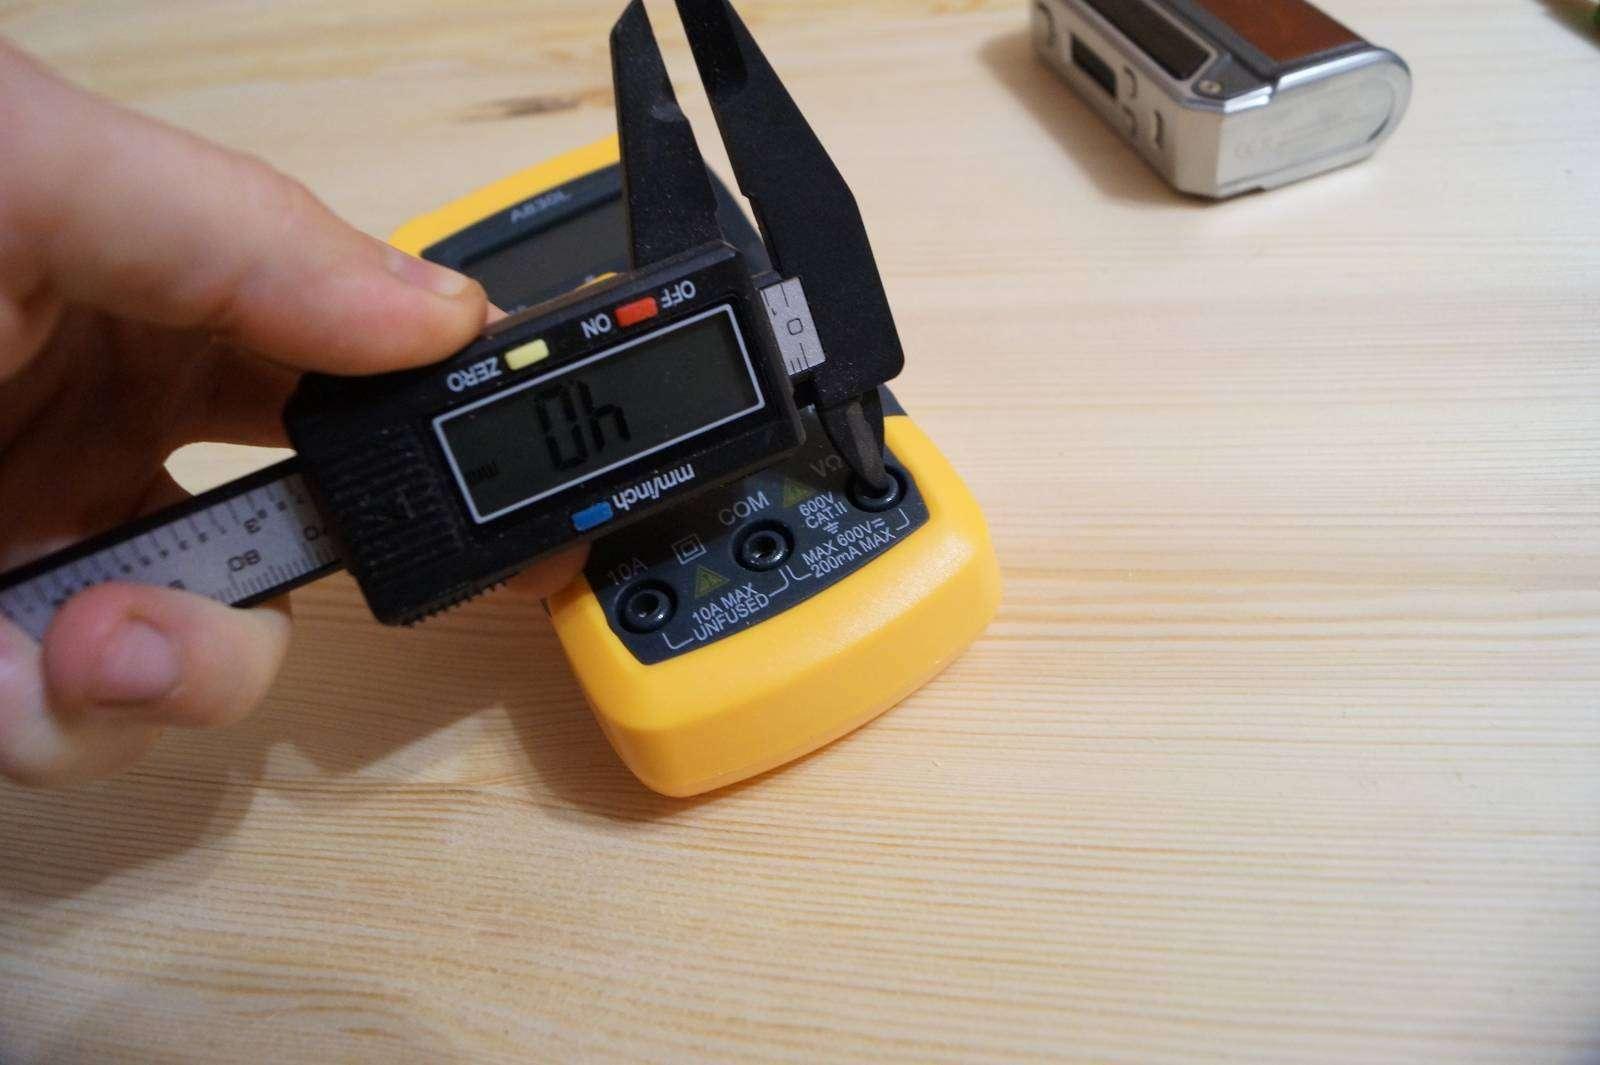 Ebay: Домашний мультиметр A830L, дешево и сердито